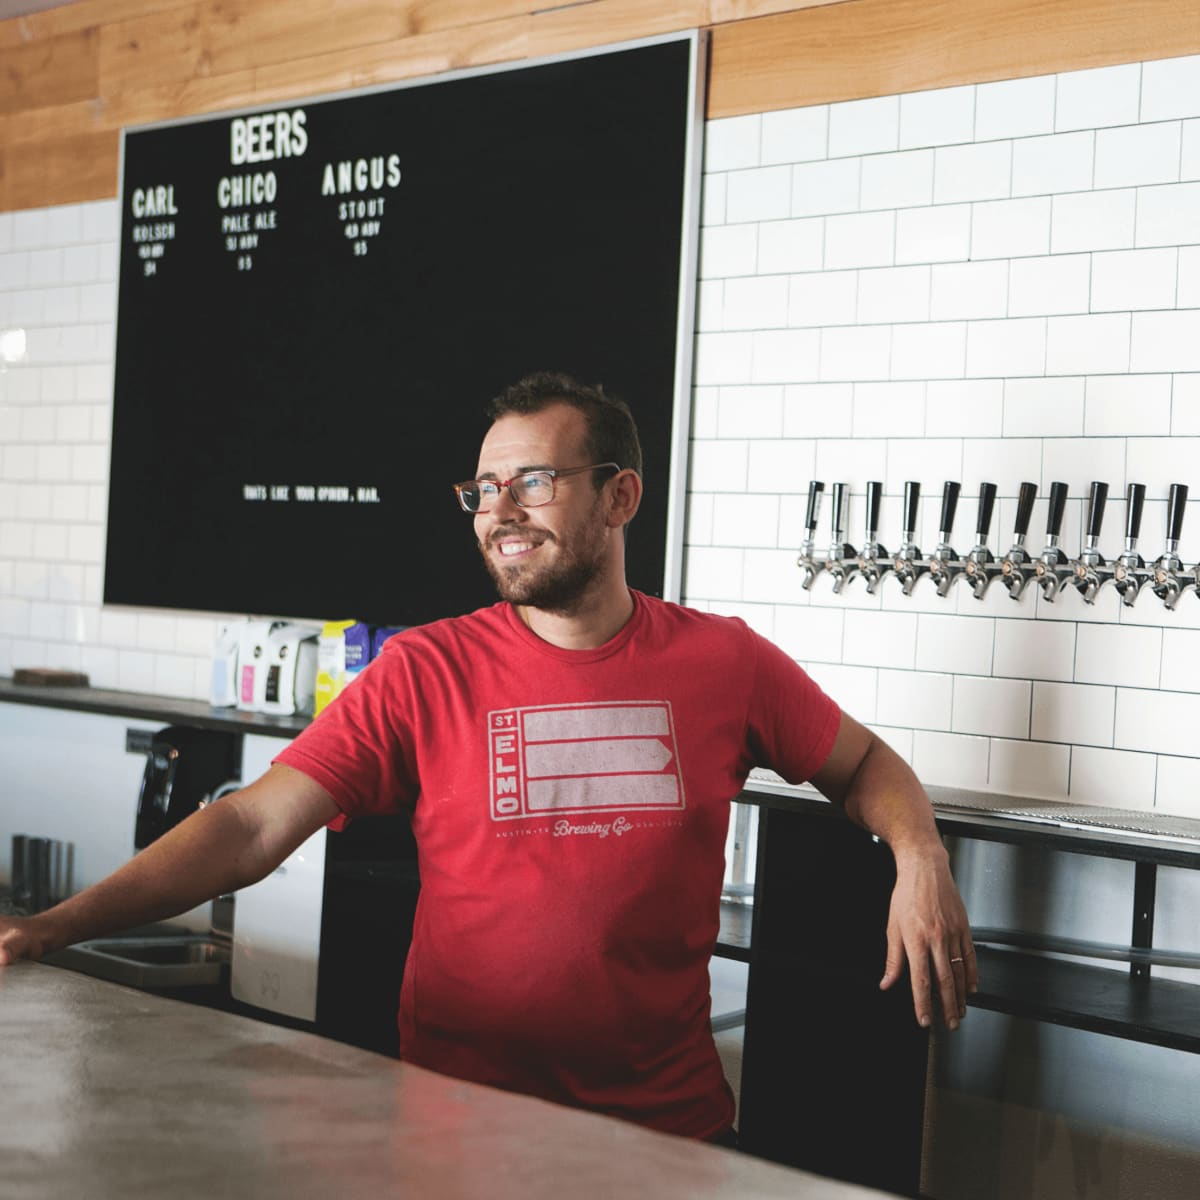 St Elmo Brewing Co Austin Tim Bullock